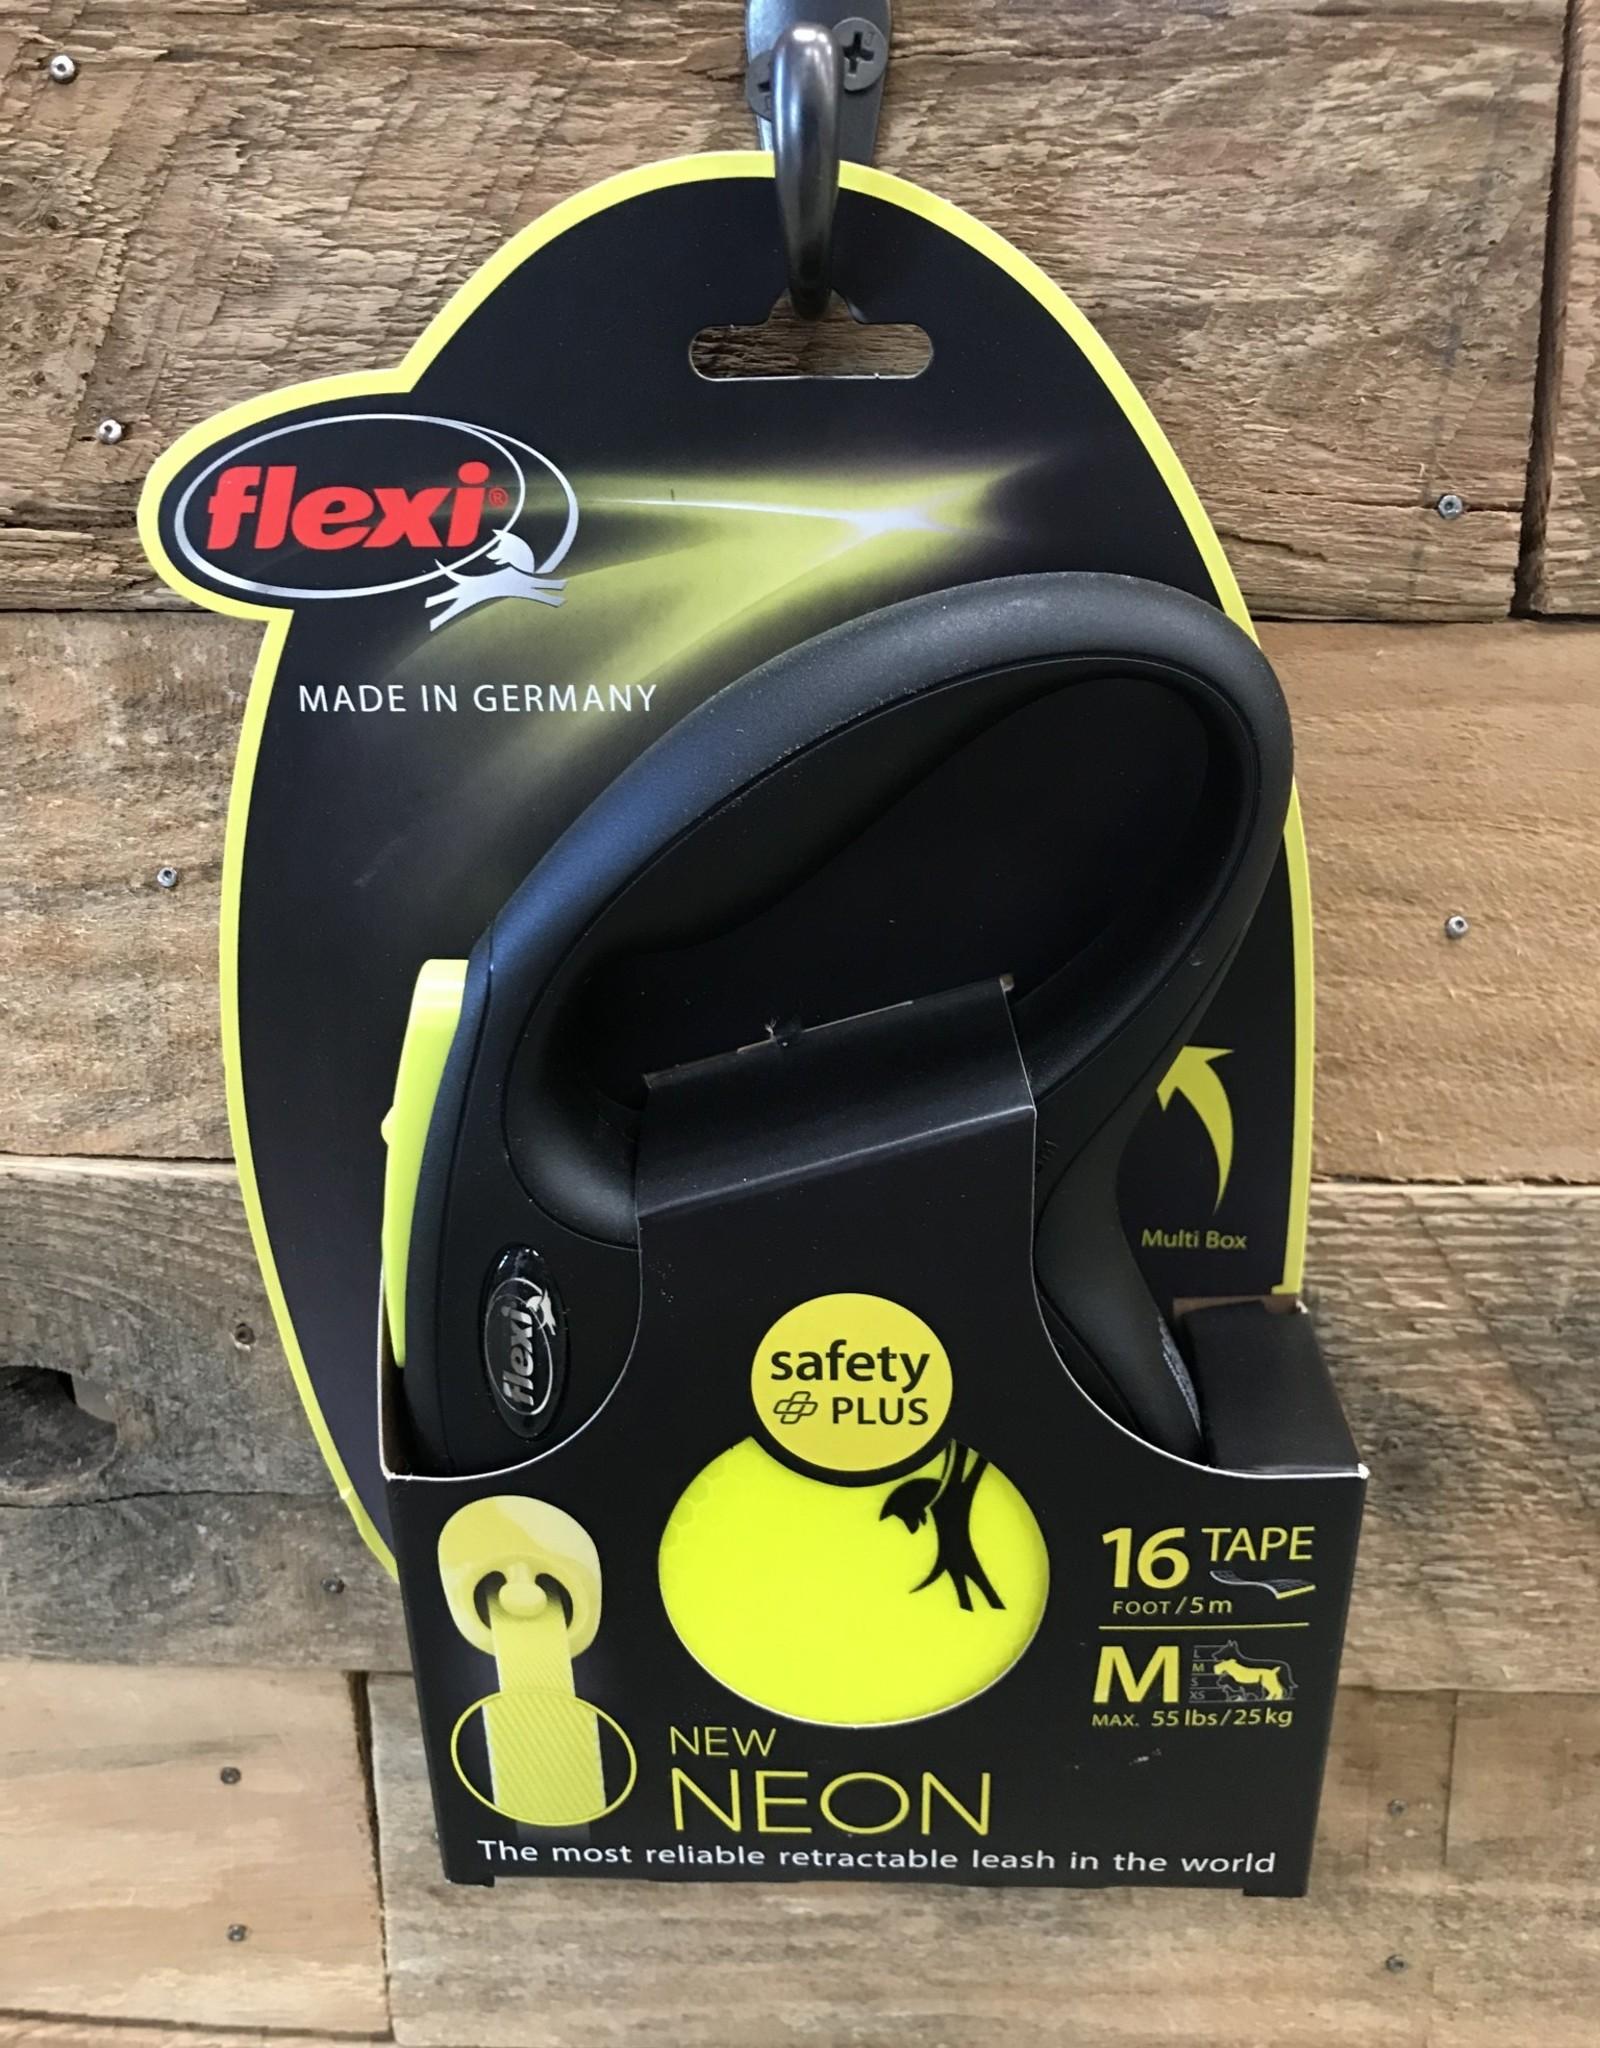 Flexi New Classic Tape Neon Yellow Reflective 16' Medium